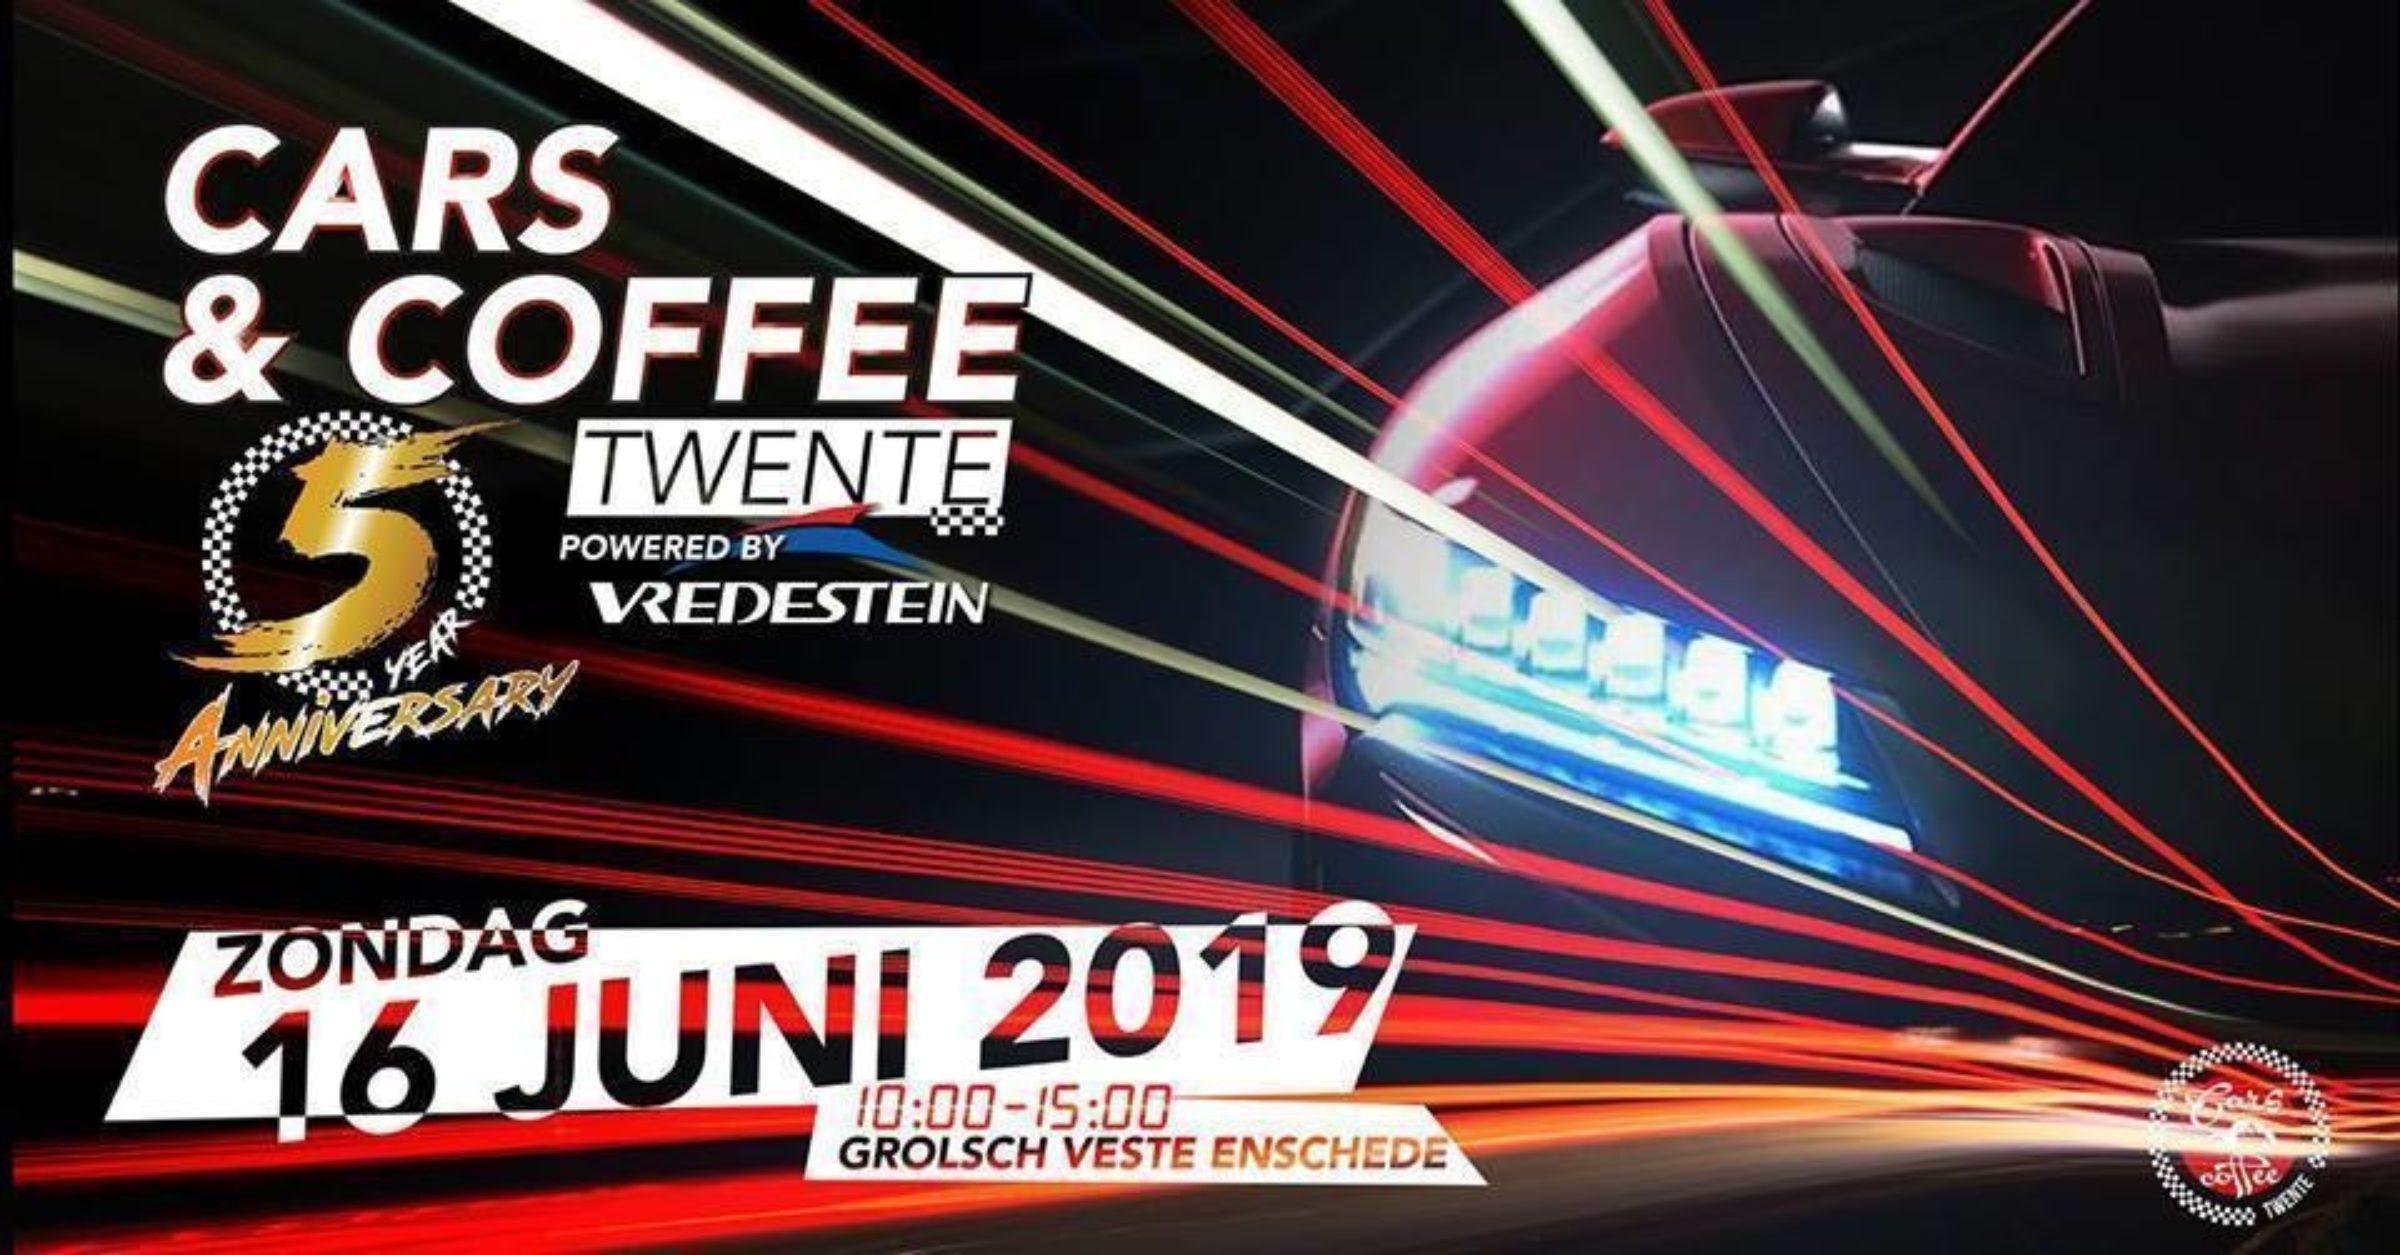 Cars coffee twente 3127 1559641657 35hxj6m33n